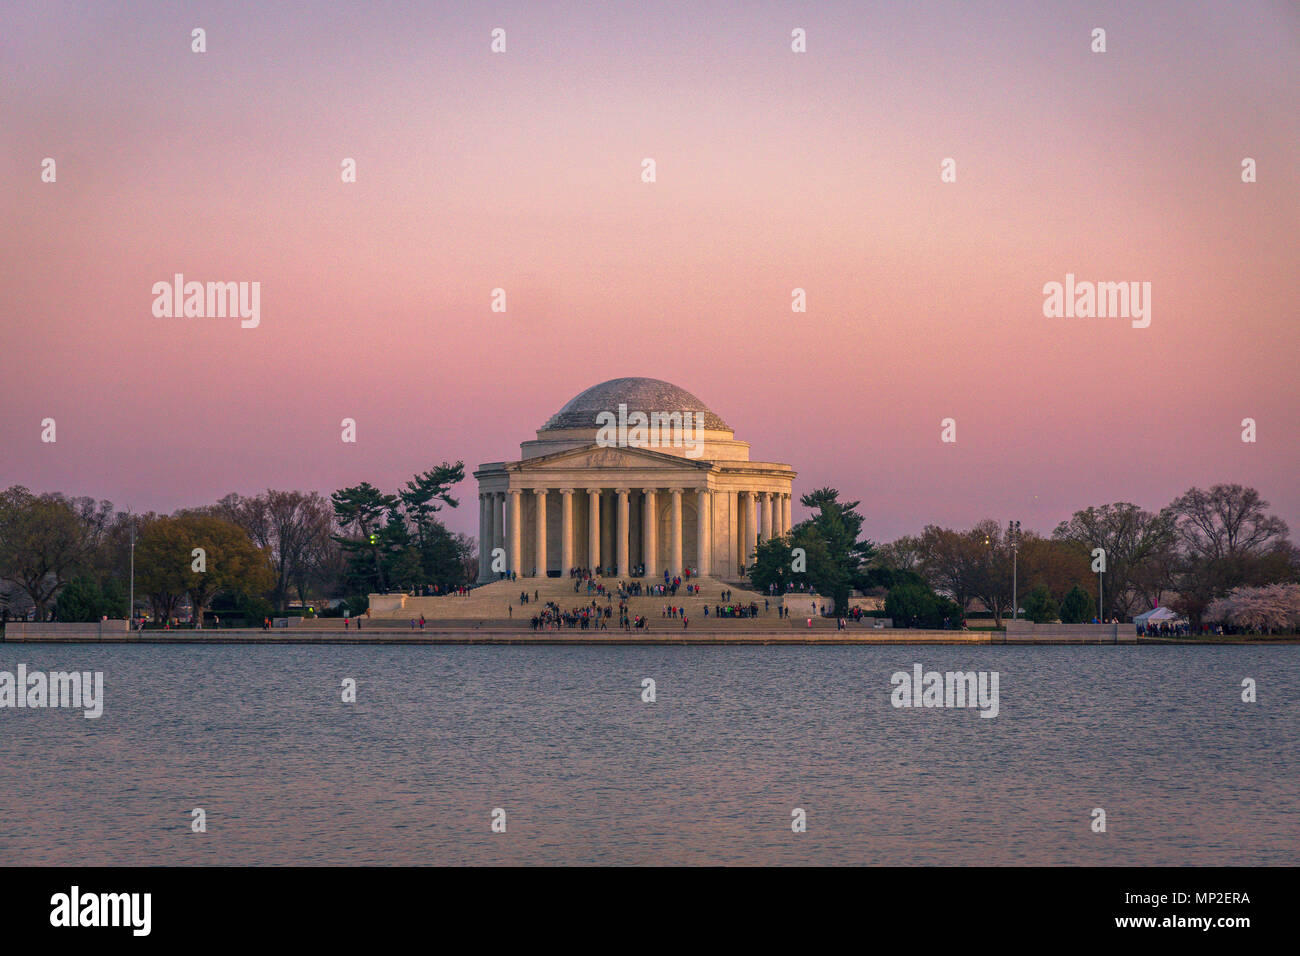 Washington, DC Cherry Blossom Festival Stock Photo